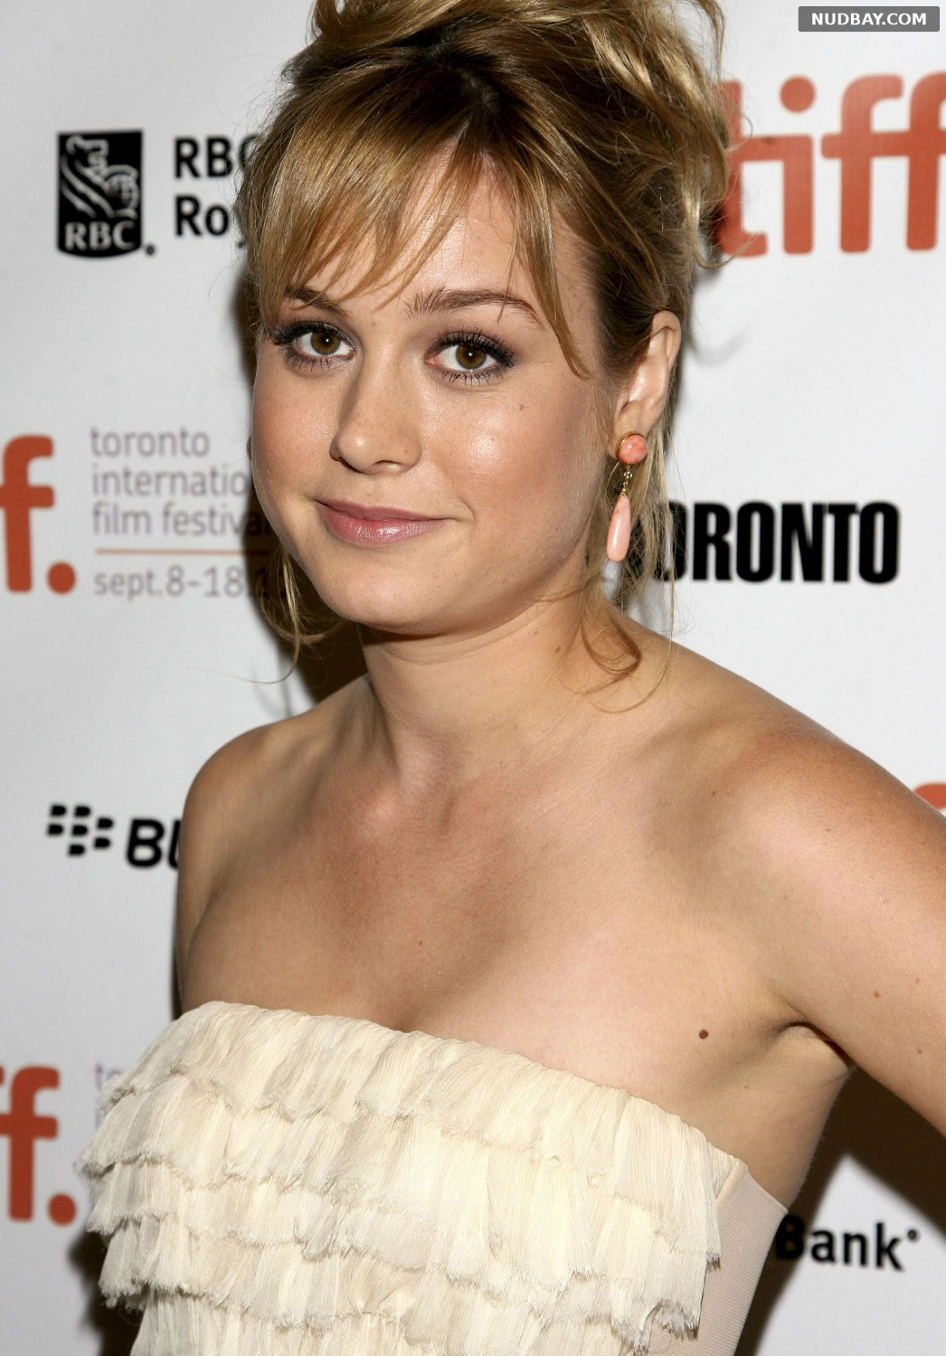 Brie Larson at International Film Festival in Toronto Sep 10 2011